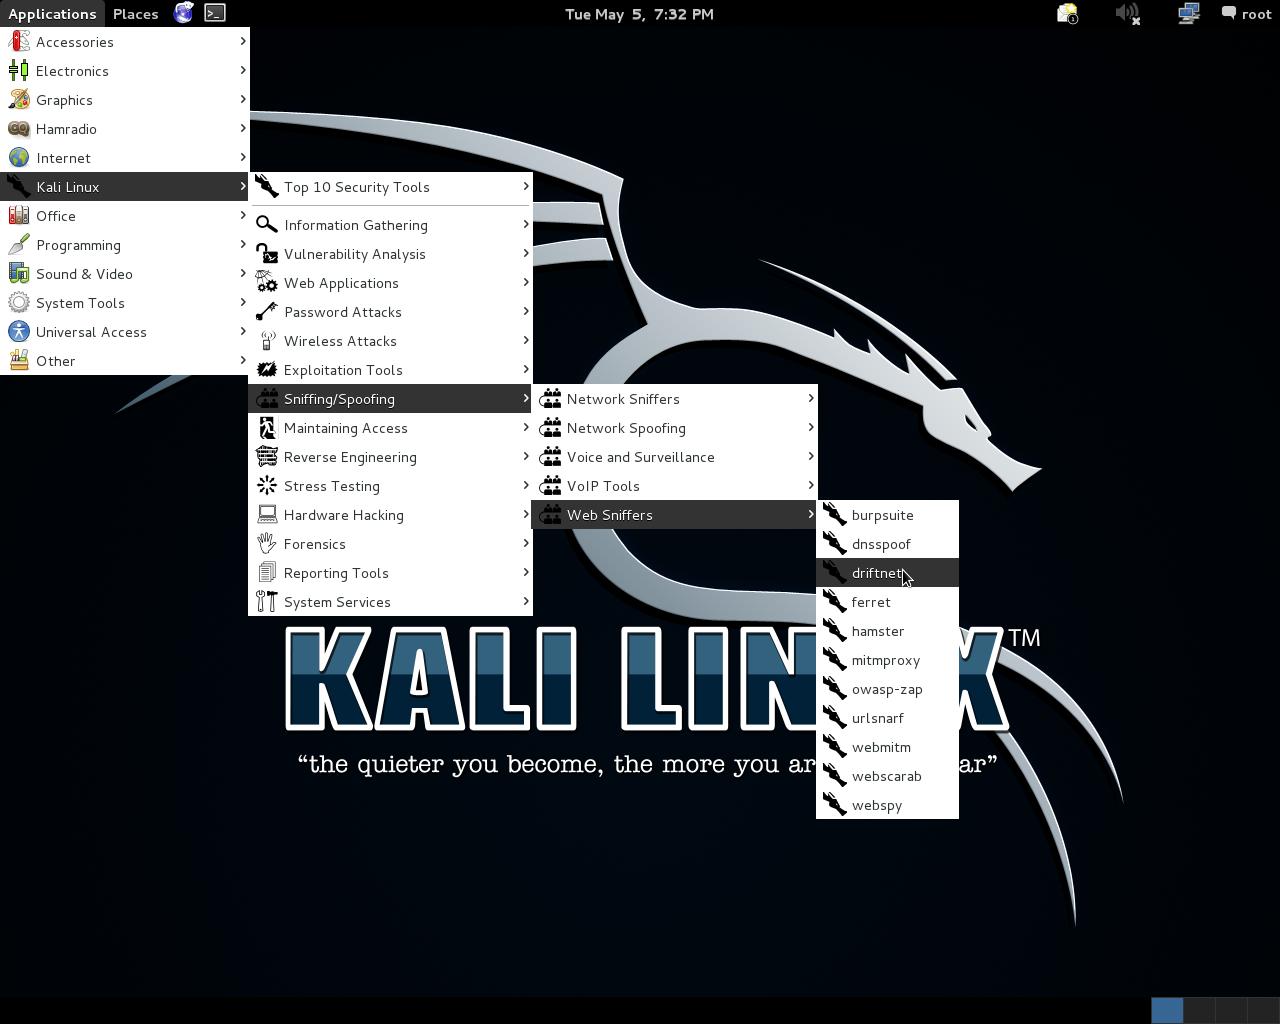 Driftnet + Kali Linux